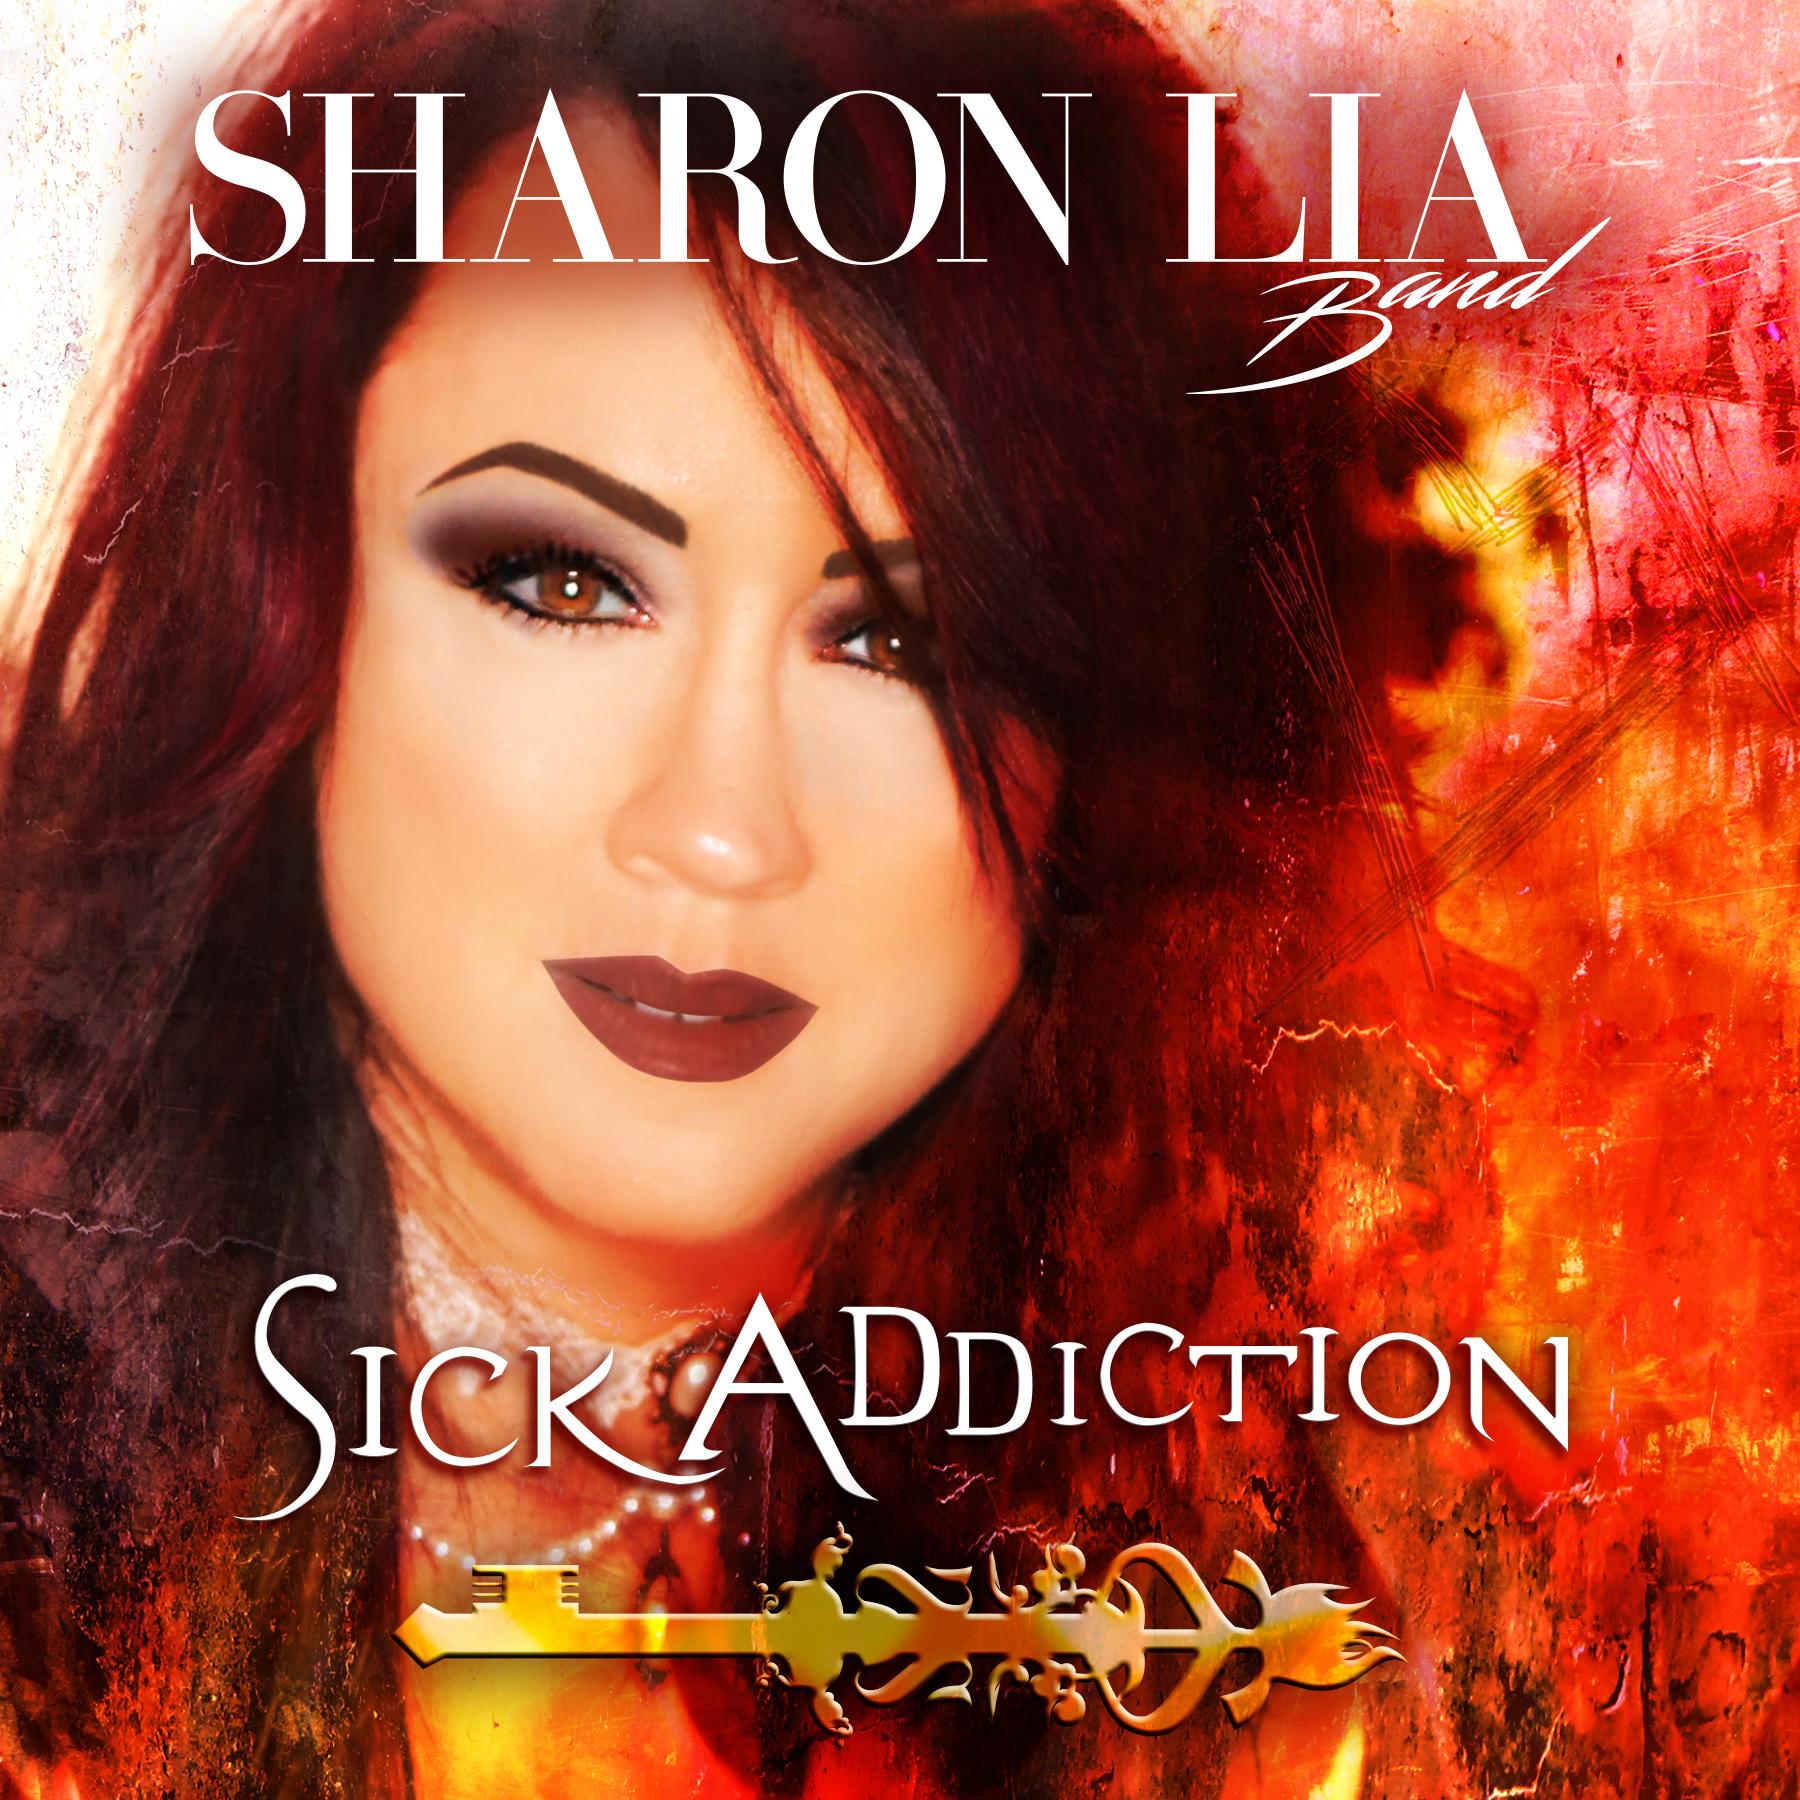 Sick Addiction single artwork Sharon Lia Band